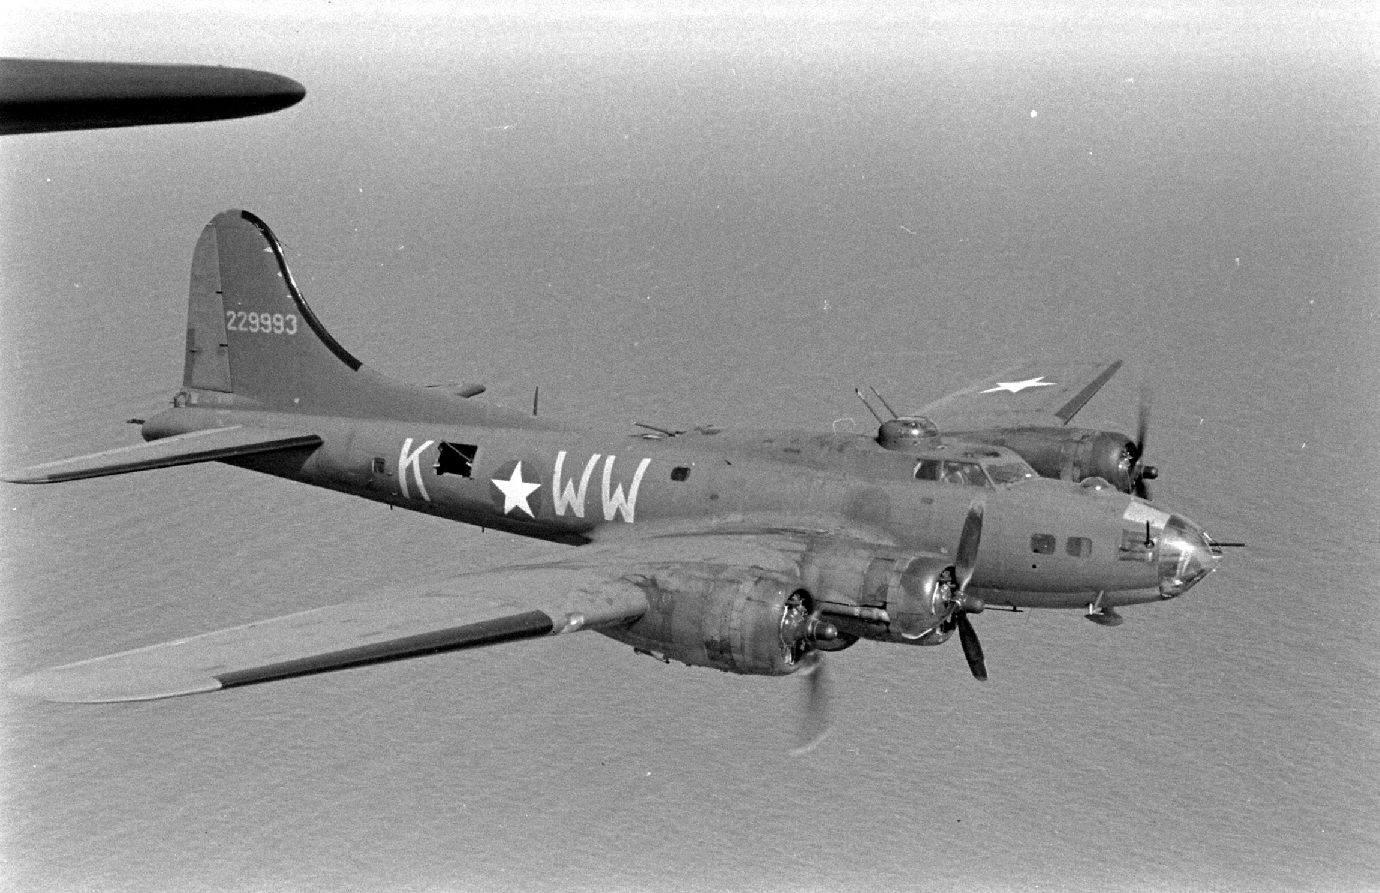 B-17 #42-29993 / Carroll Jun